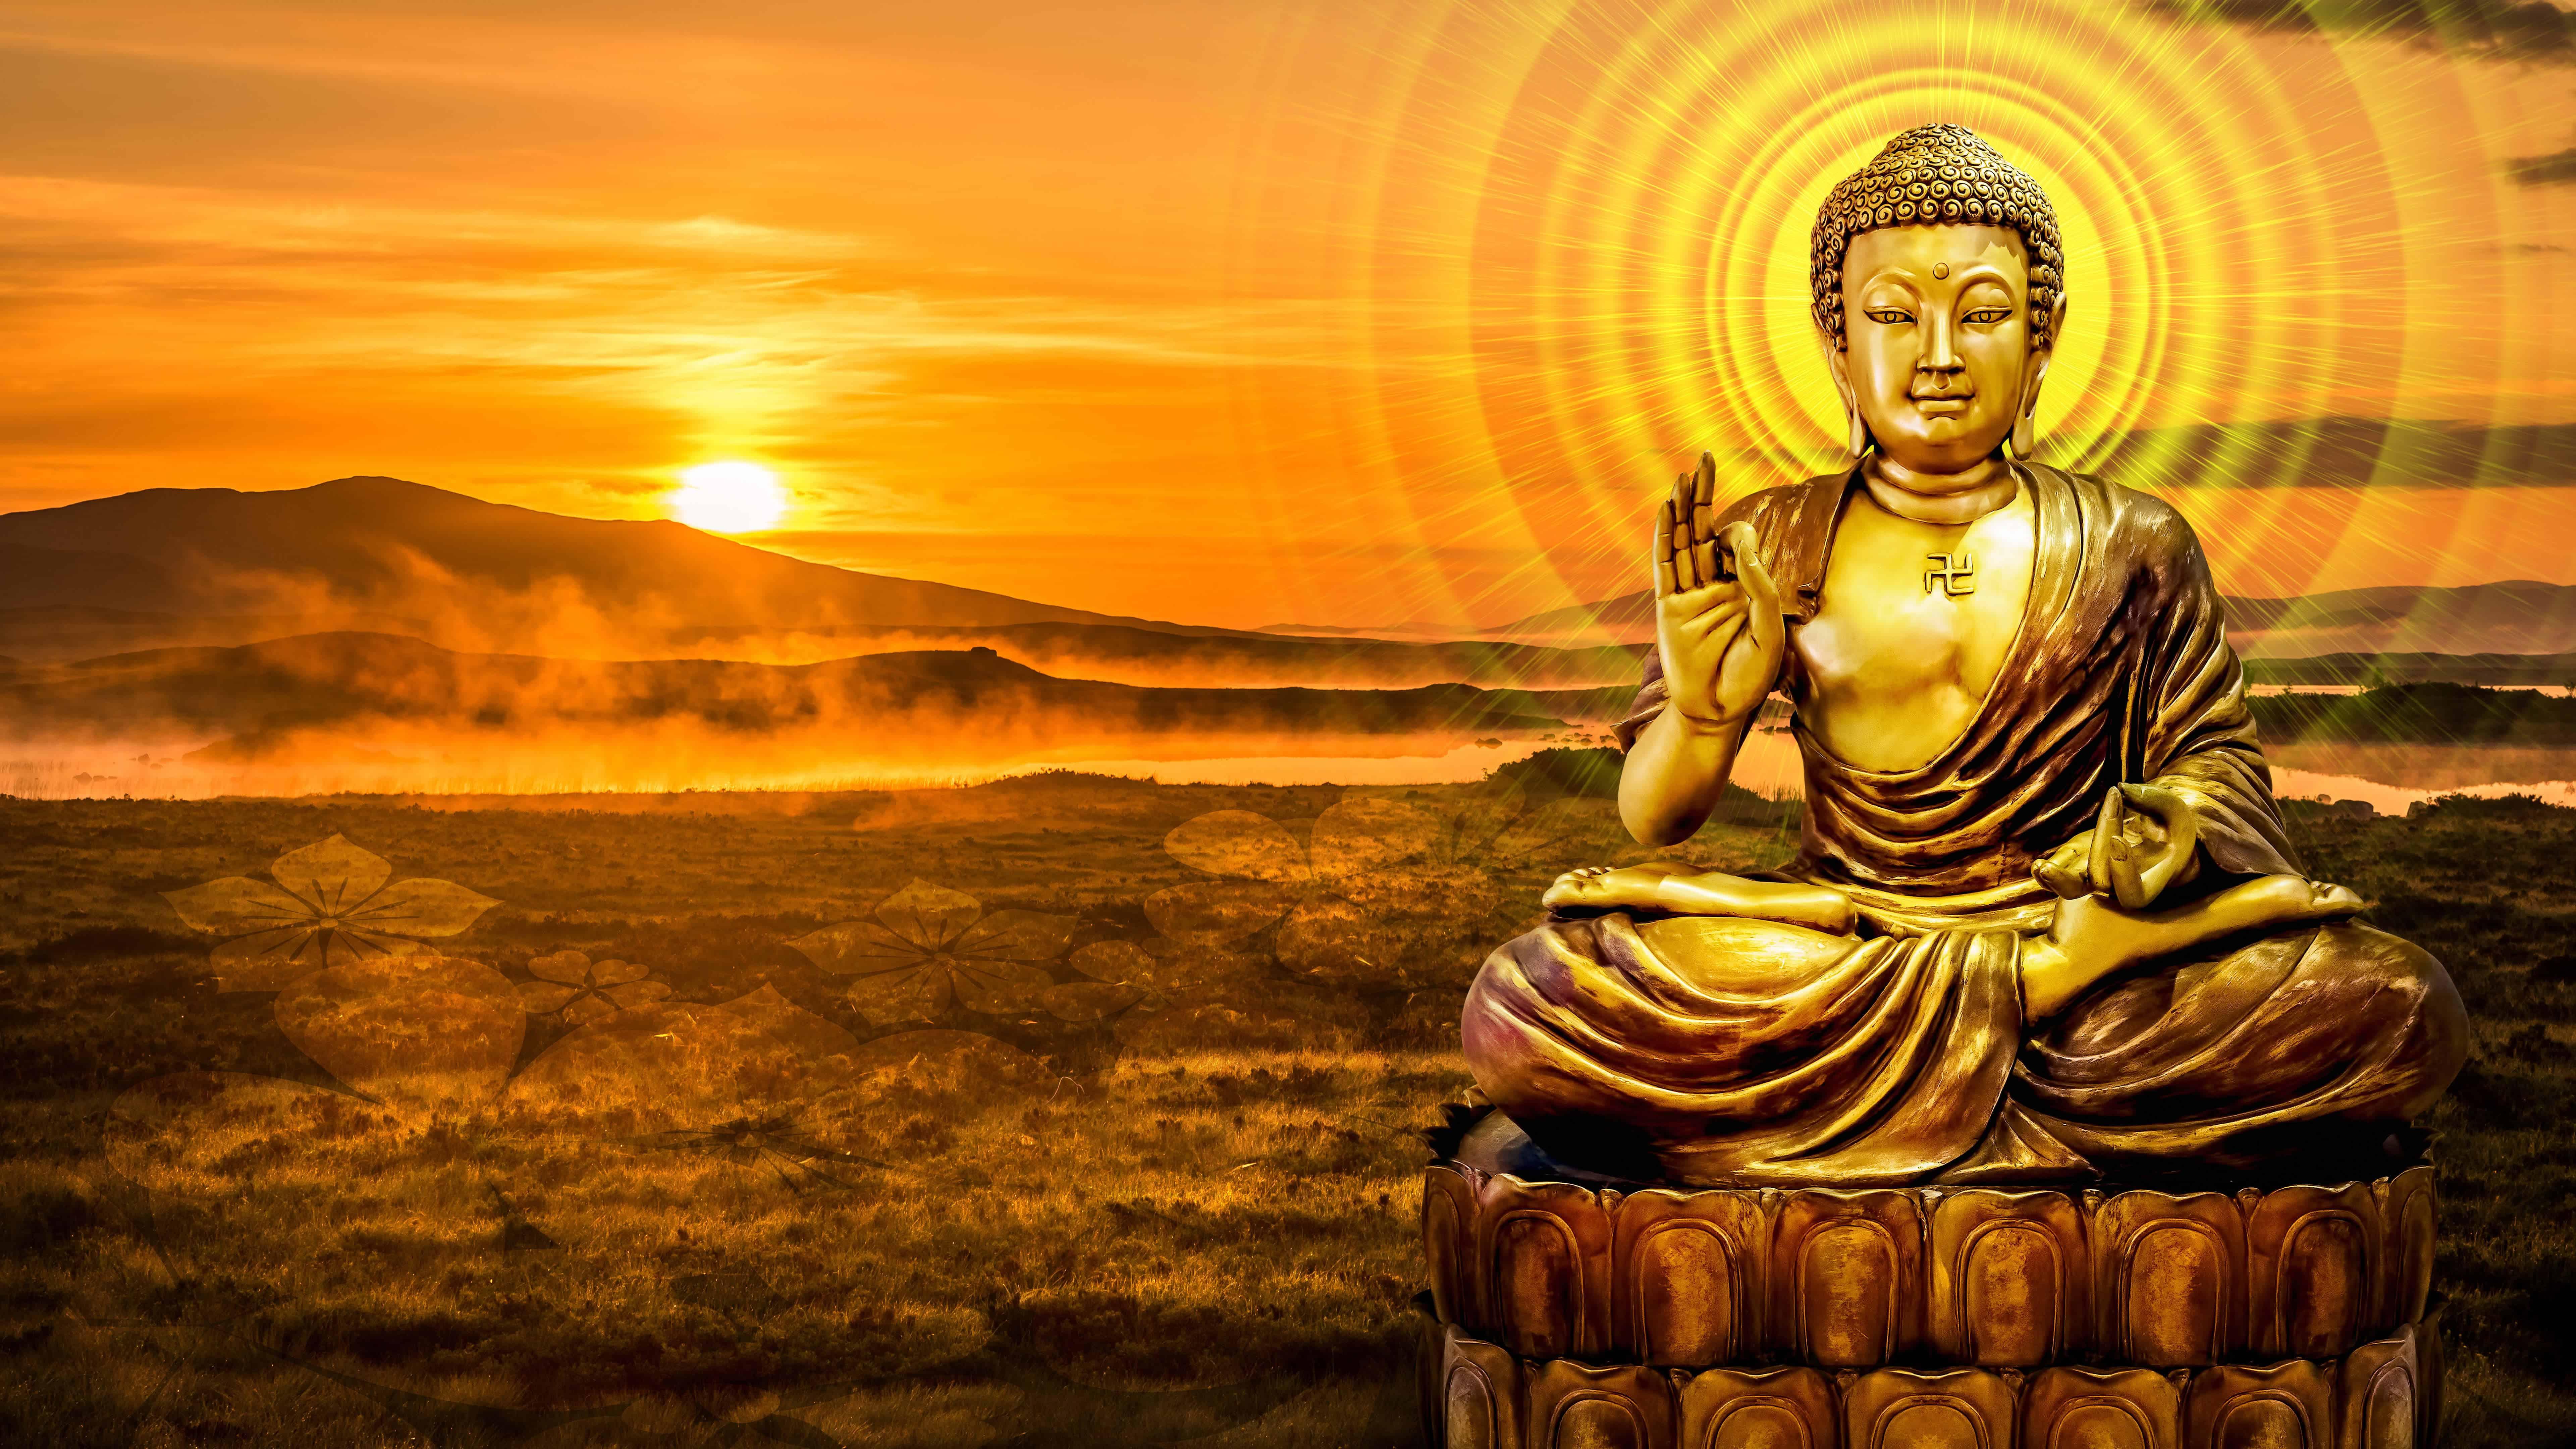 Gautam Buddha Full Hd Wallpapers: Top Free Buddha HD Backgrounds